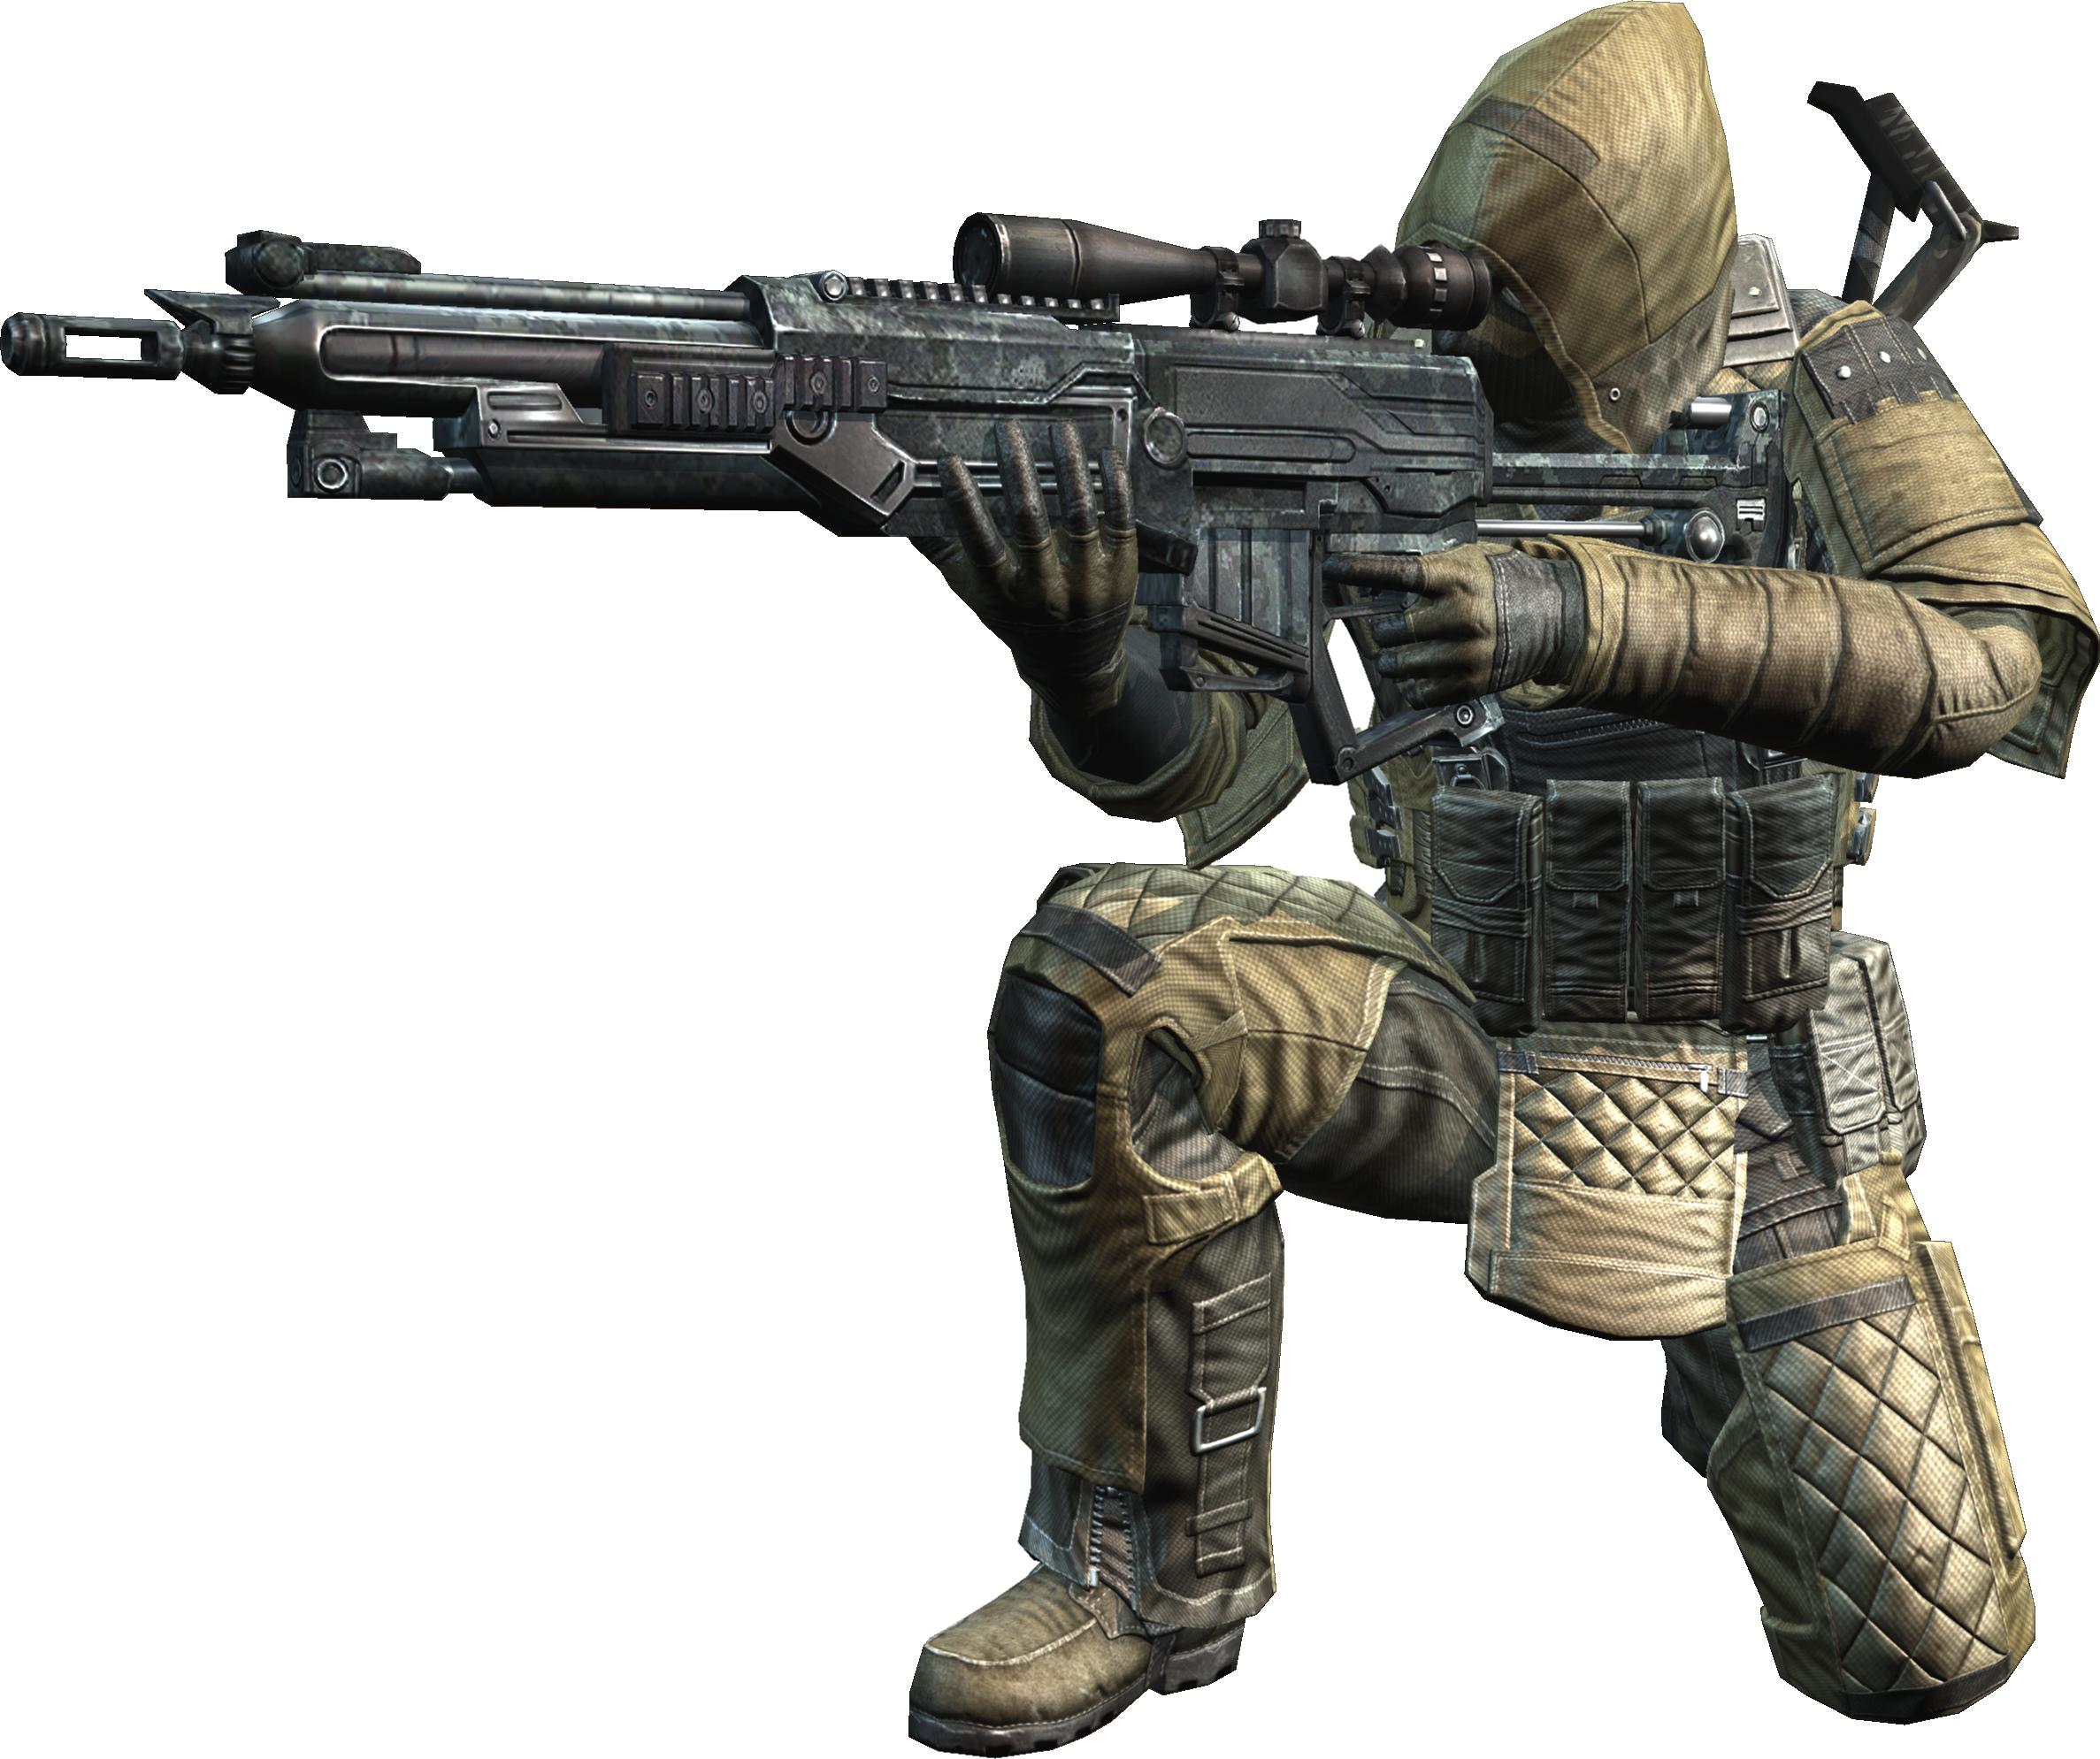 『HOUNDS:ハウンズ』『レベル15到達で強力な武器防具ゲット!新規入隊キャンペーン実施!』<男性キャラクター特典アイテム装備例>